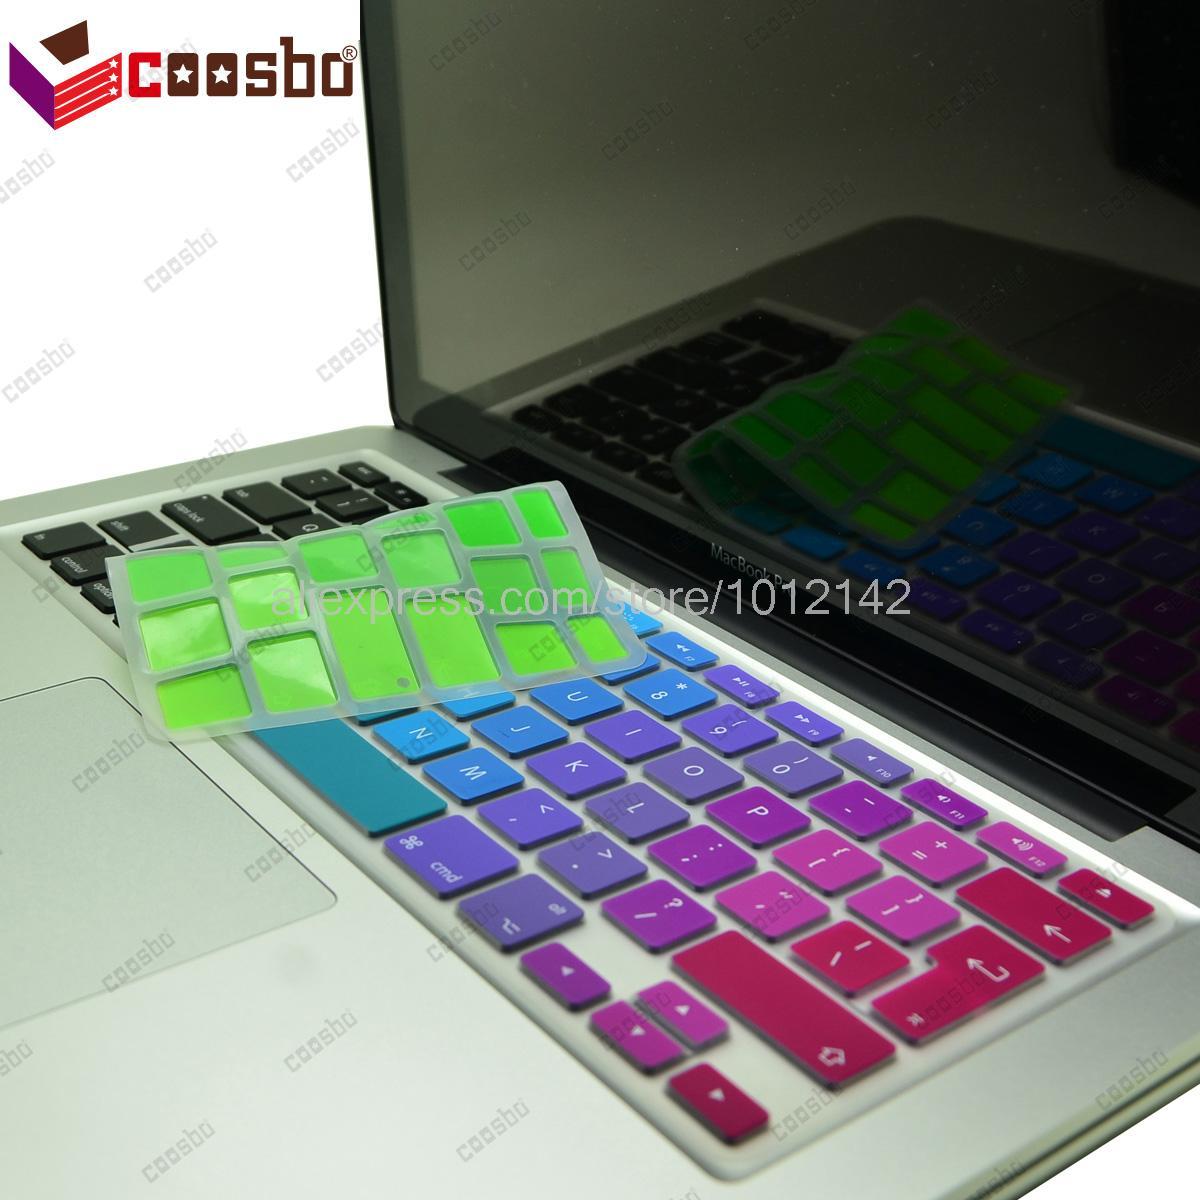 50 pcs prix de gros colorful EU / UK keyboard Cover Skin pour Apple Mac MacBook air pro retina 11 13 15 17 Protecter Film cadeau